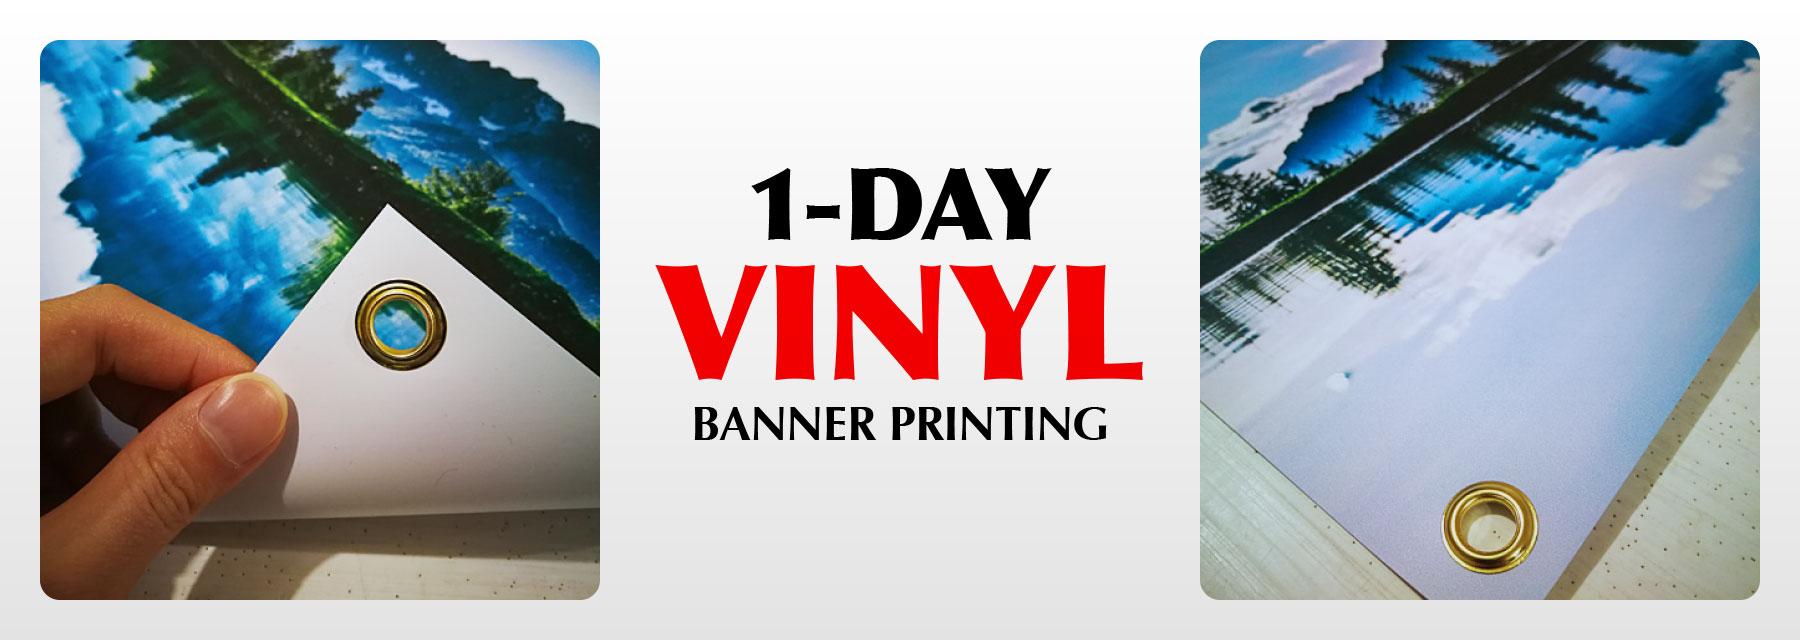 Vinyl Banner Printing Waterproof 1 Day Rush Service Low